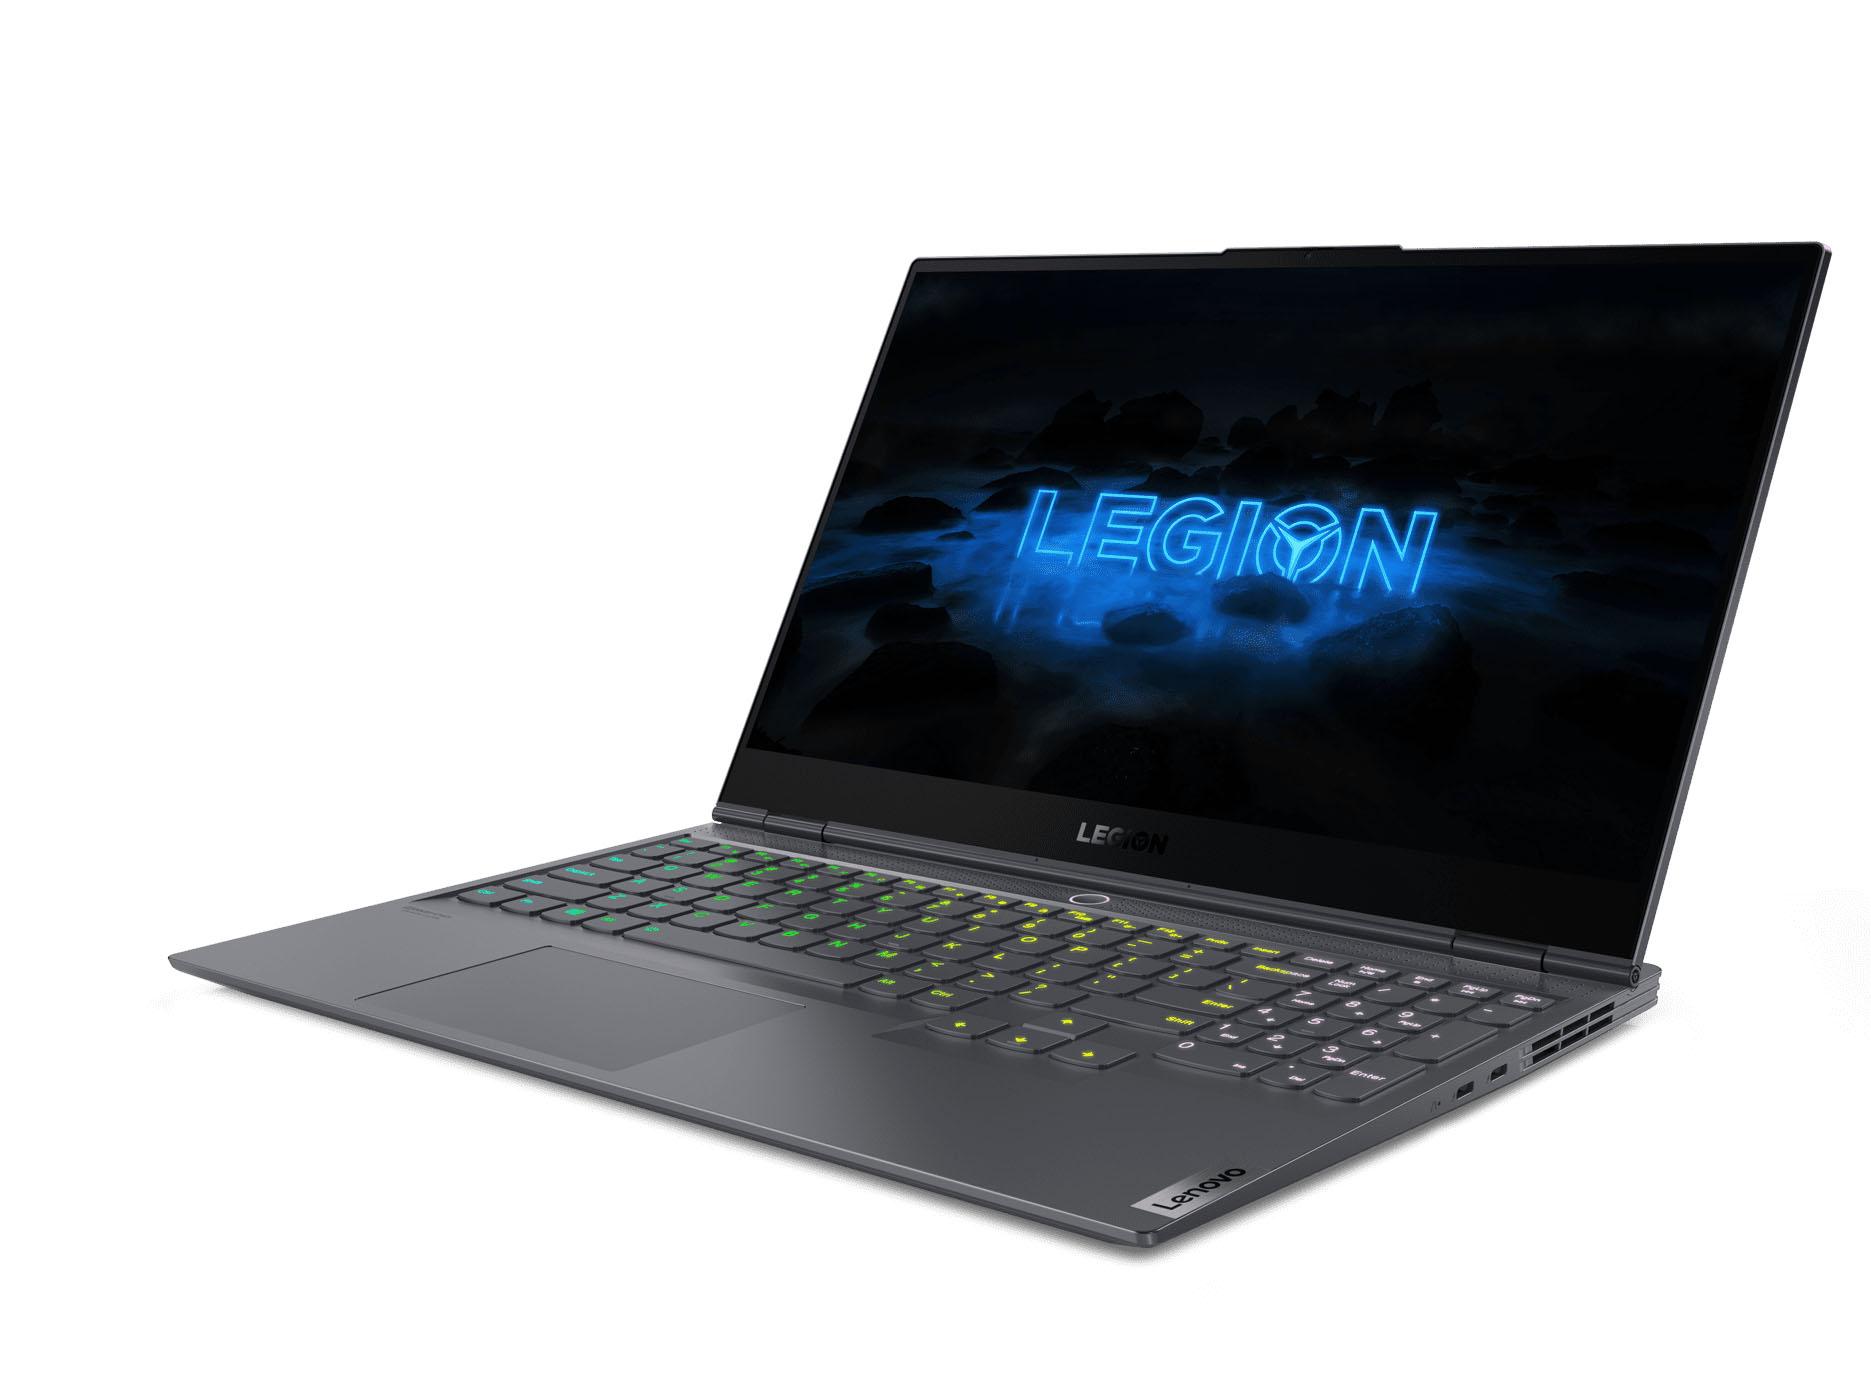 Lenovo Legion Slim 7i Facing Right